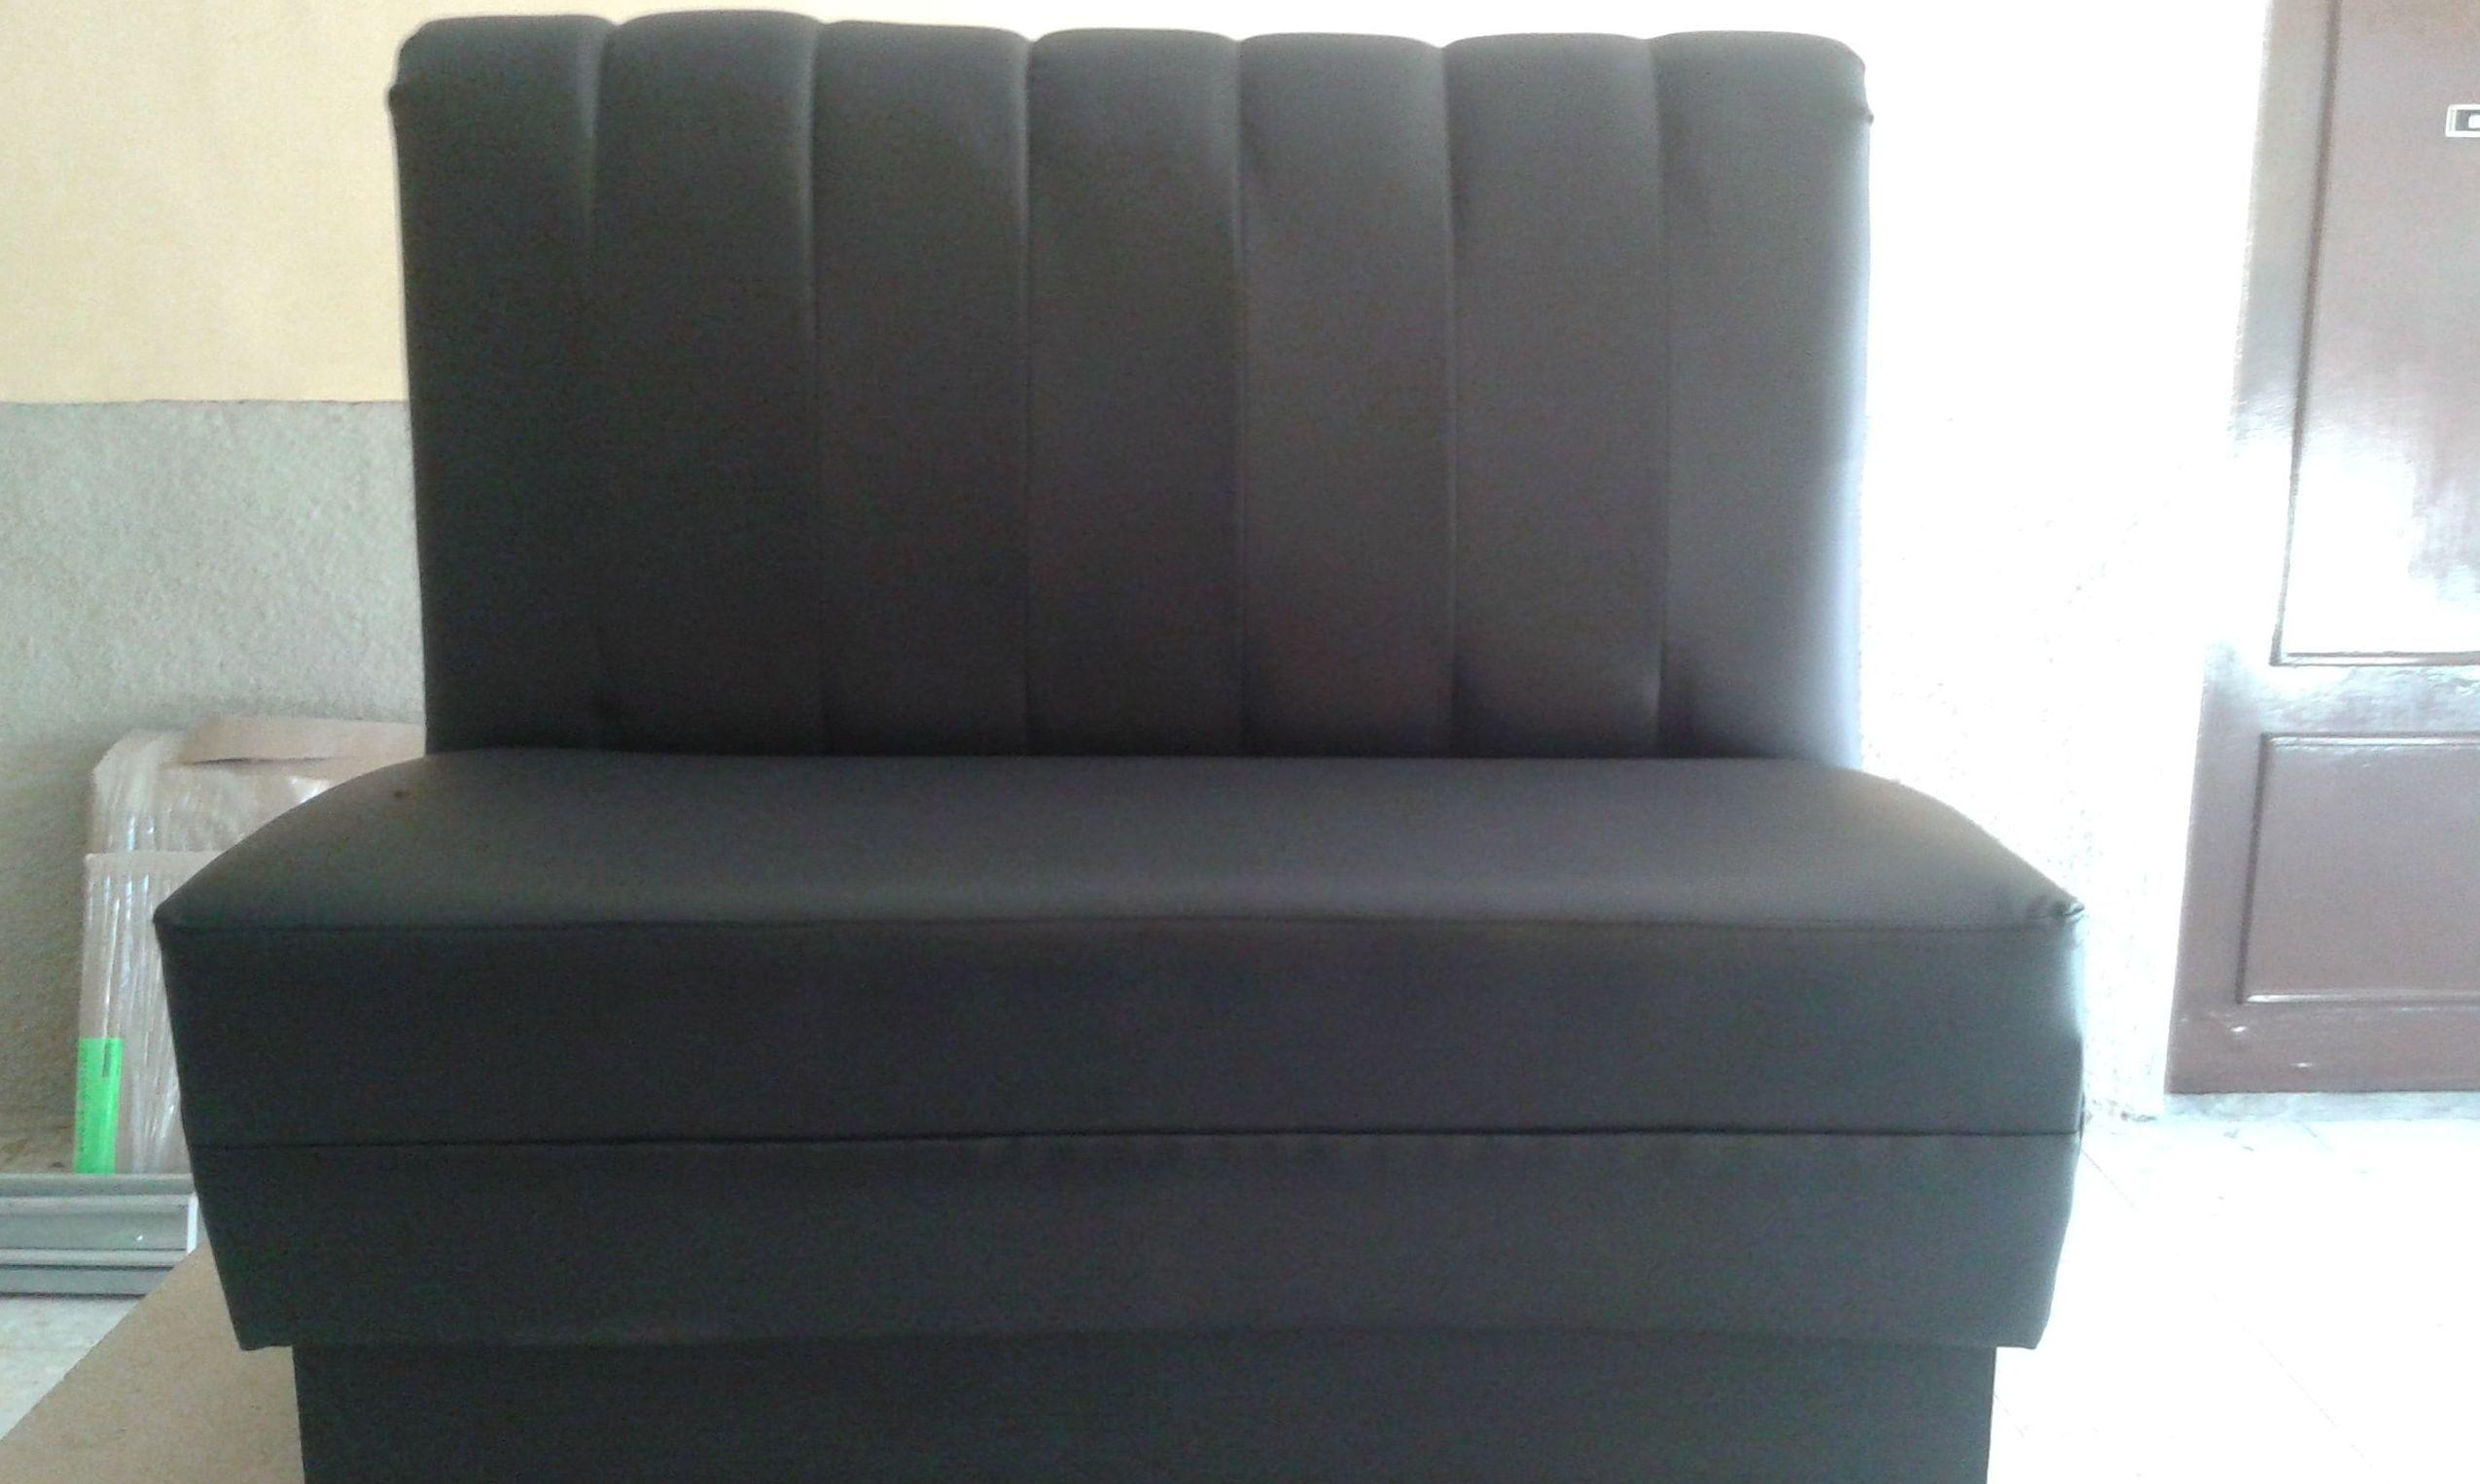 Precios de tapizados de sof s en toledo econ micos for Tapizados sofas precios